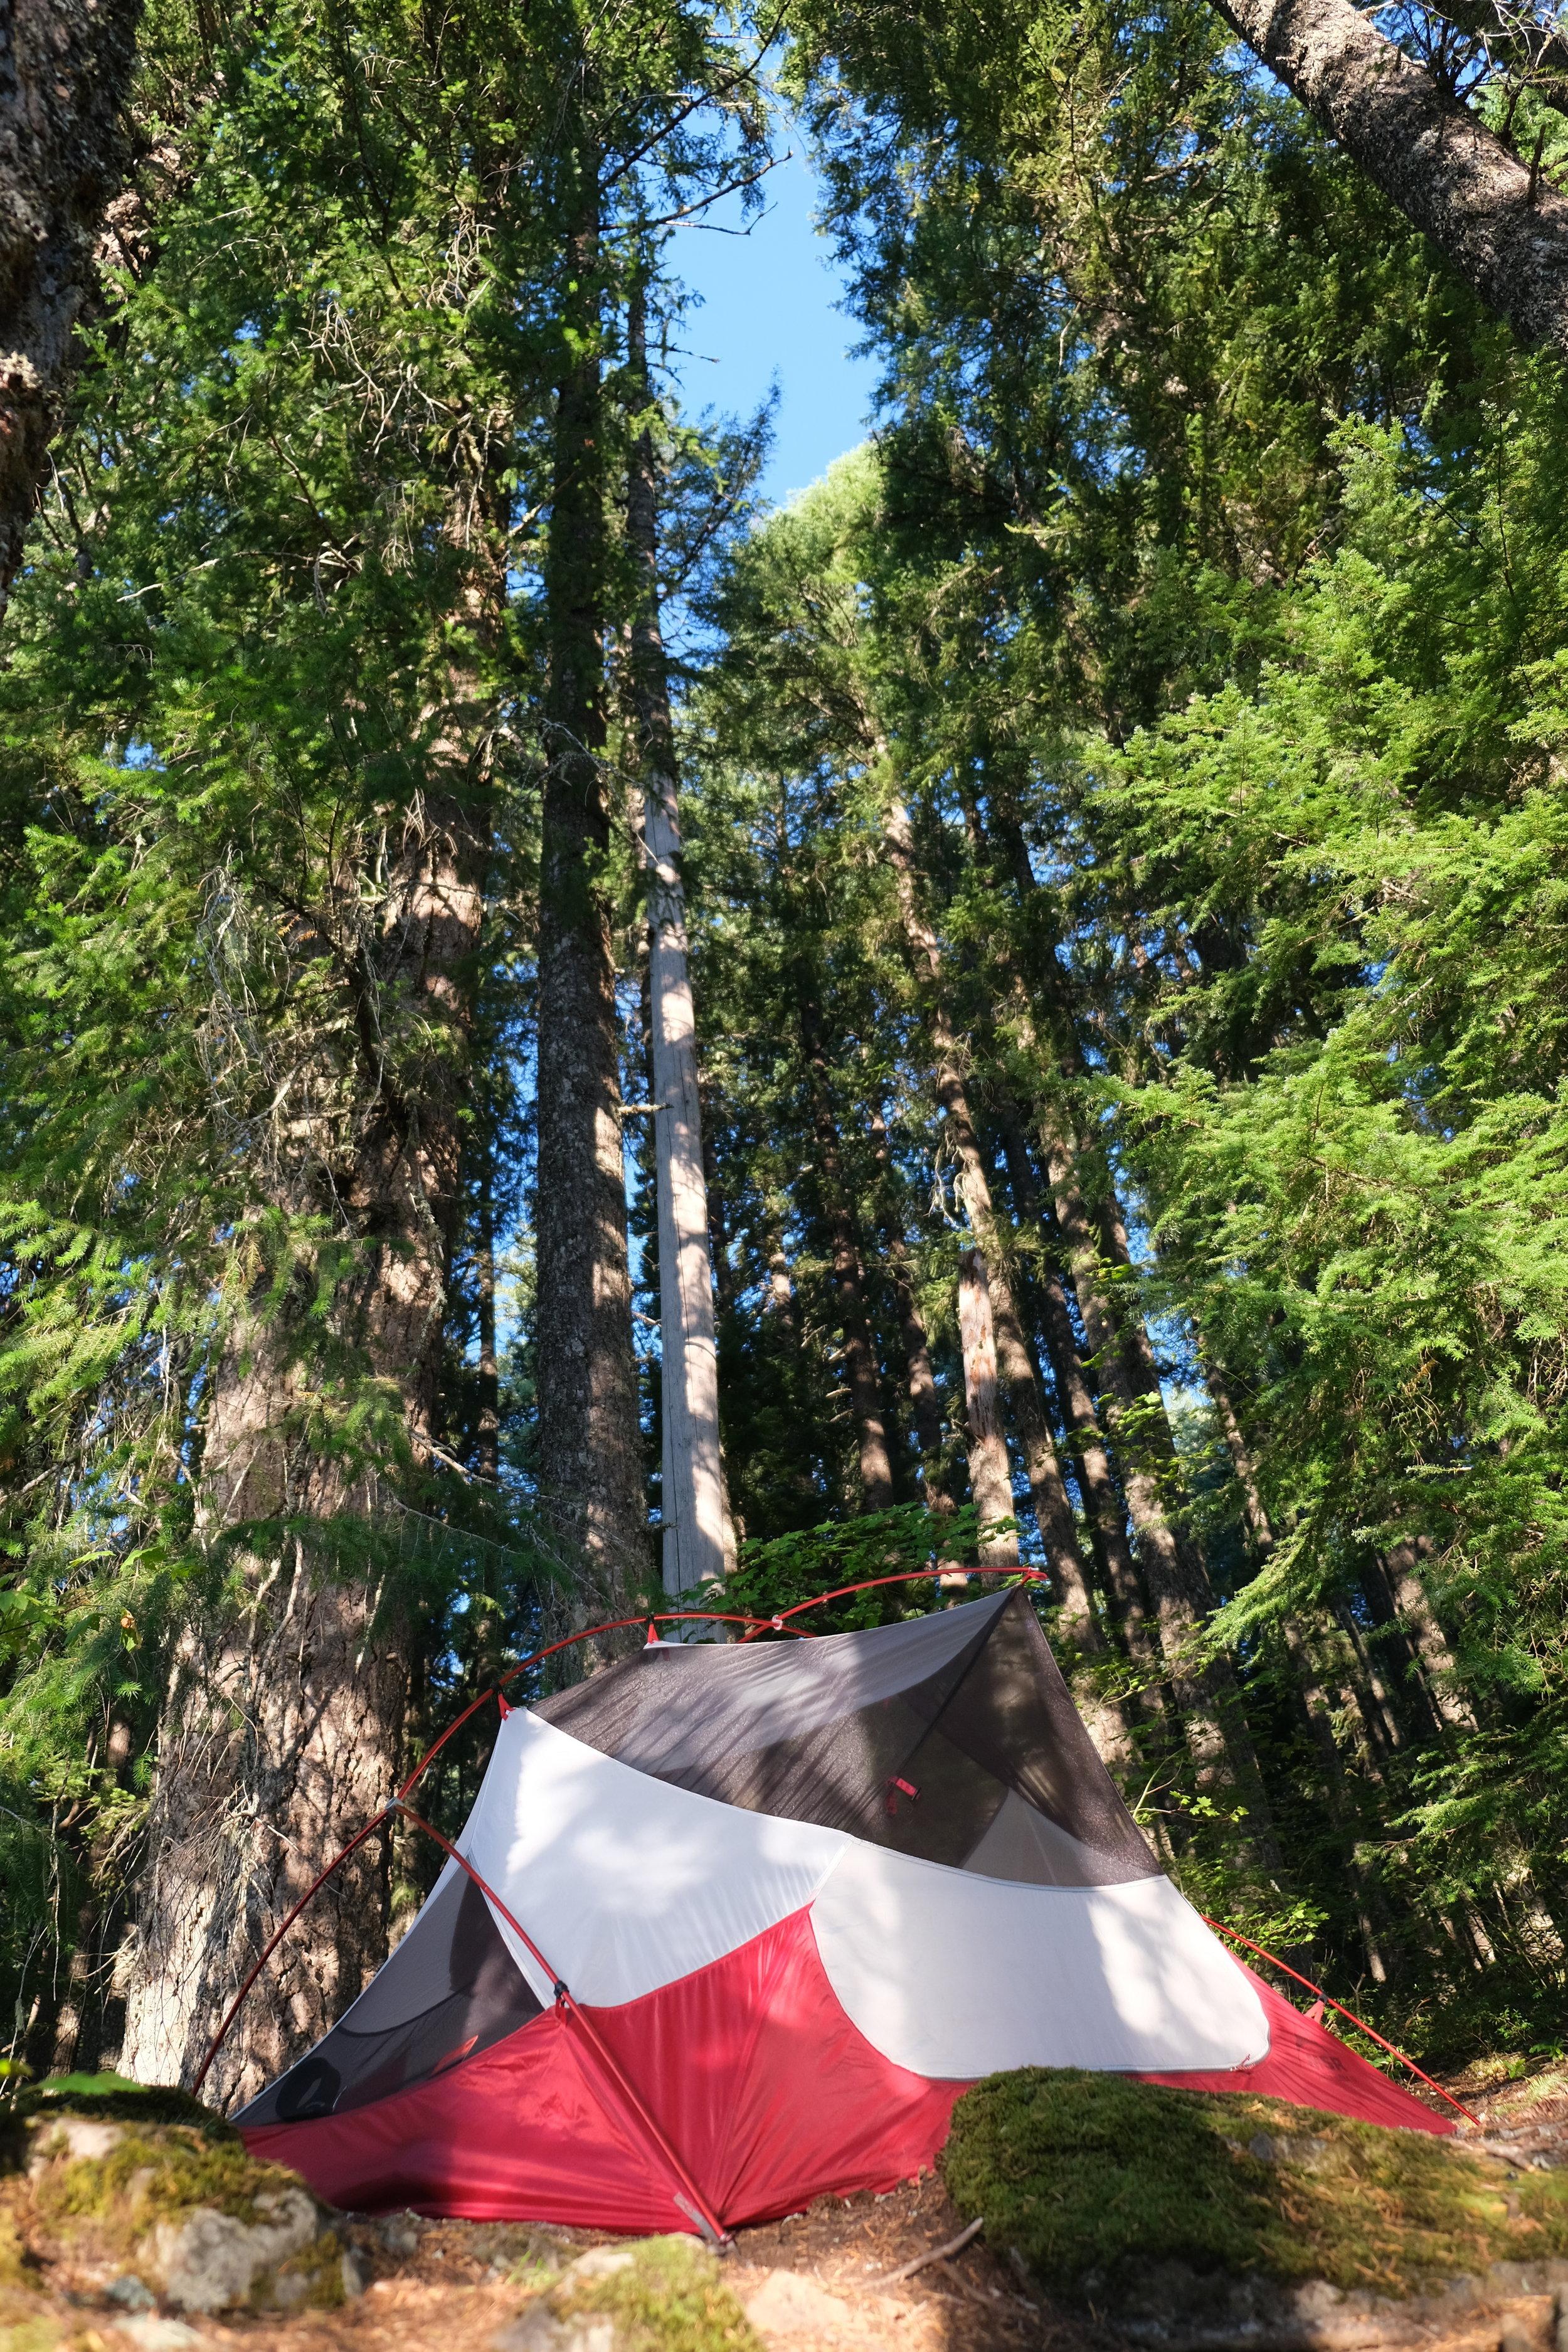 An OK camp spot, on balance